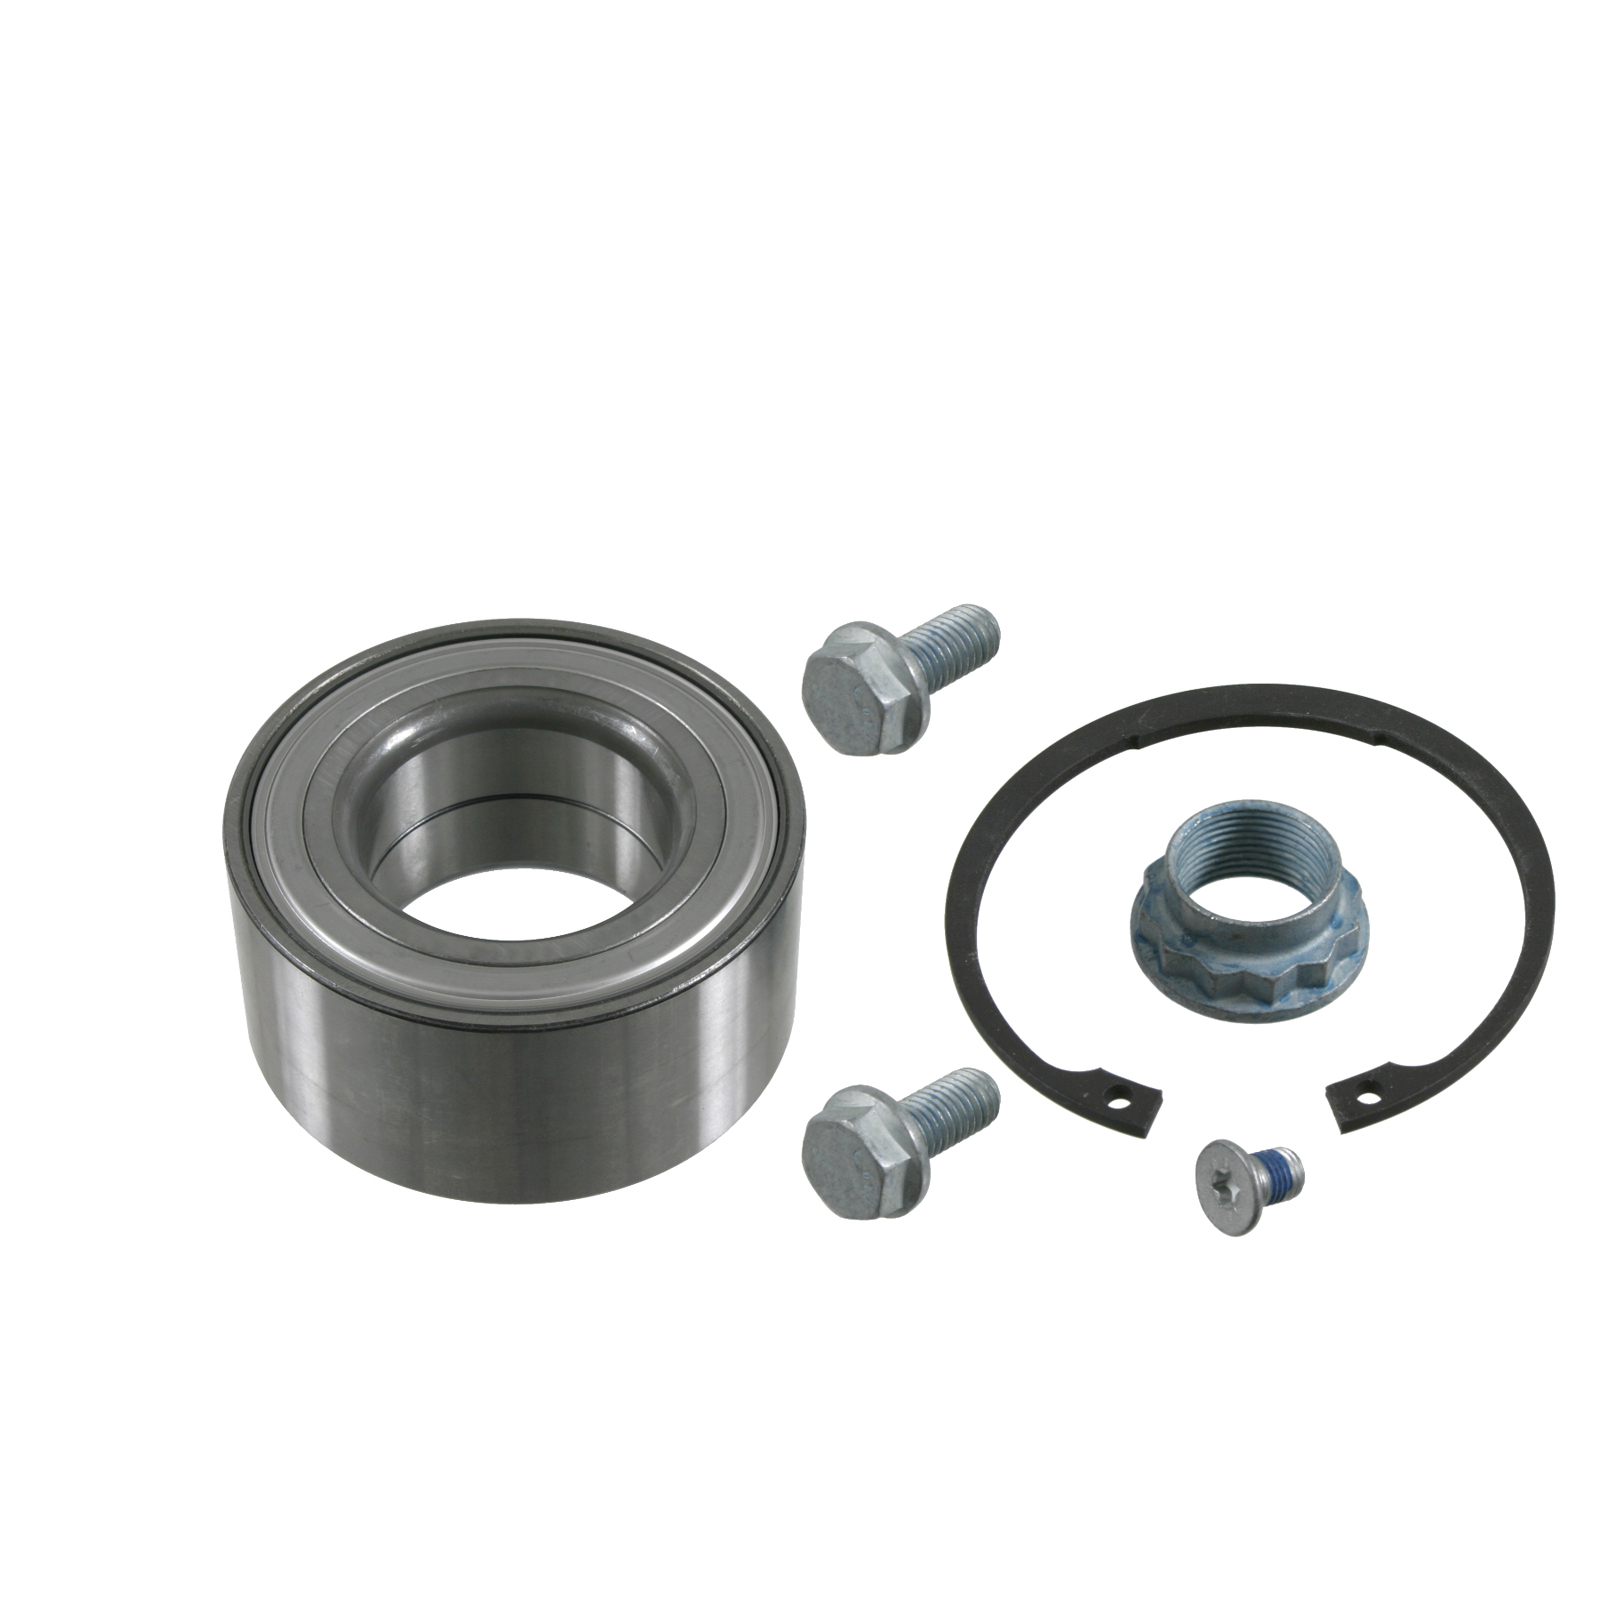 FEBI 21697 Radlagersatz MERCEDES CLK C209 A209 200-500 / 63 AMG / 220-320 CDI hinten